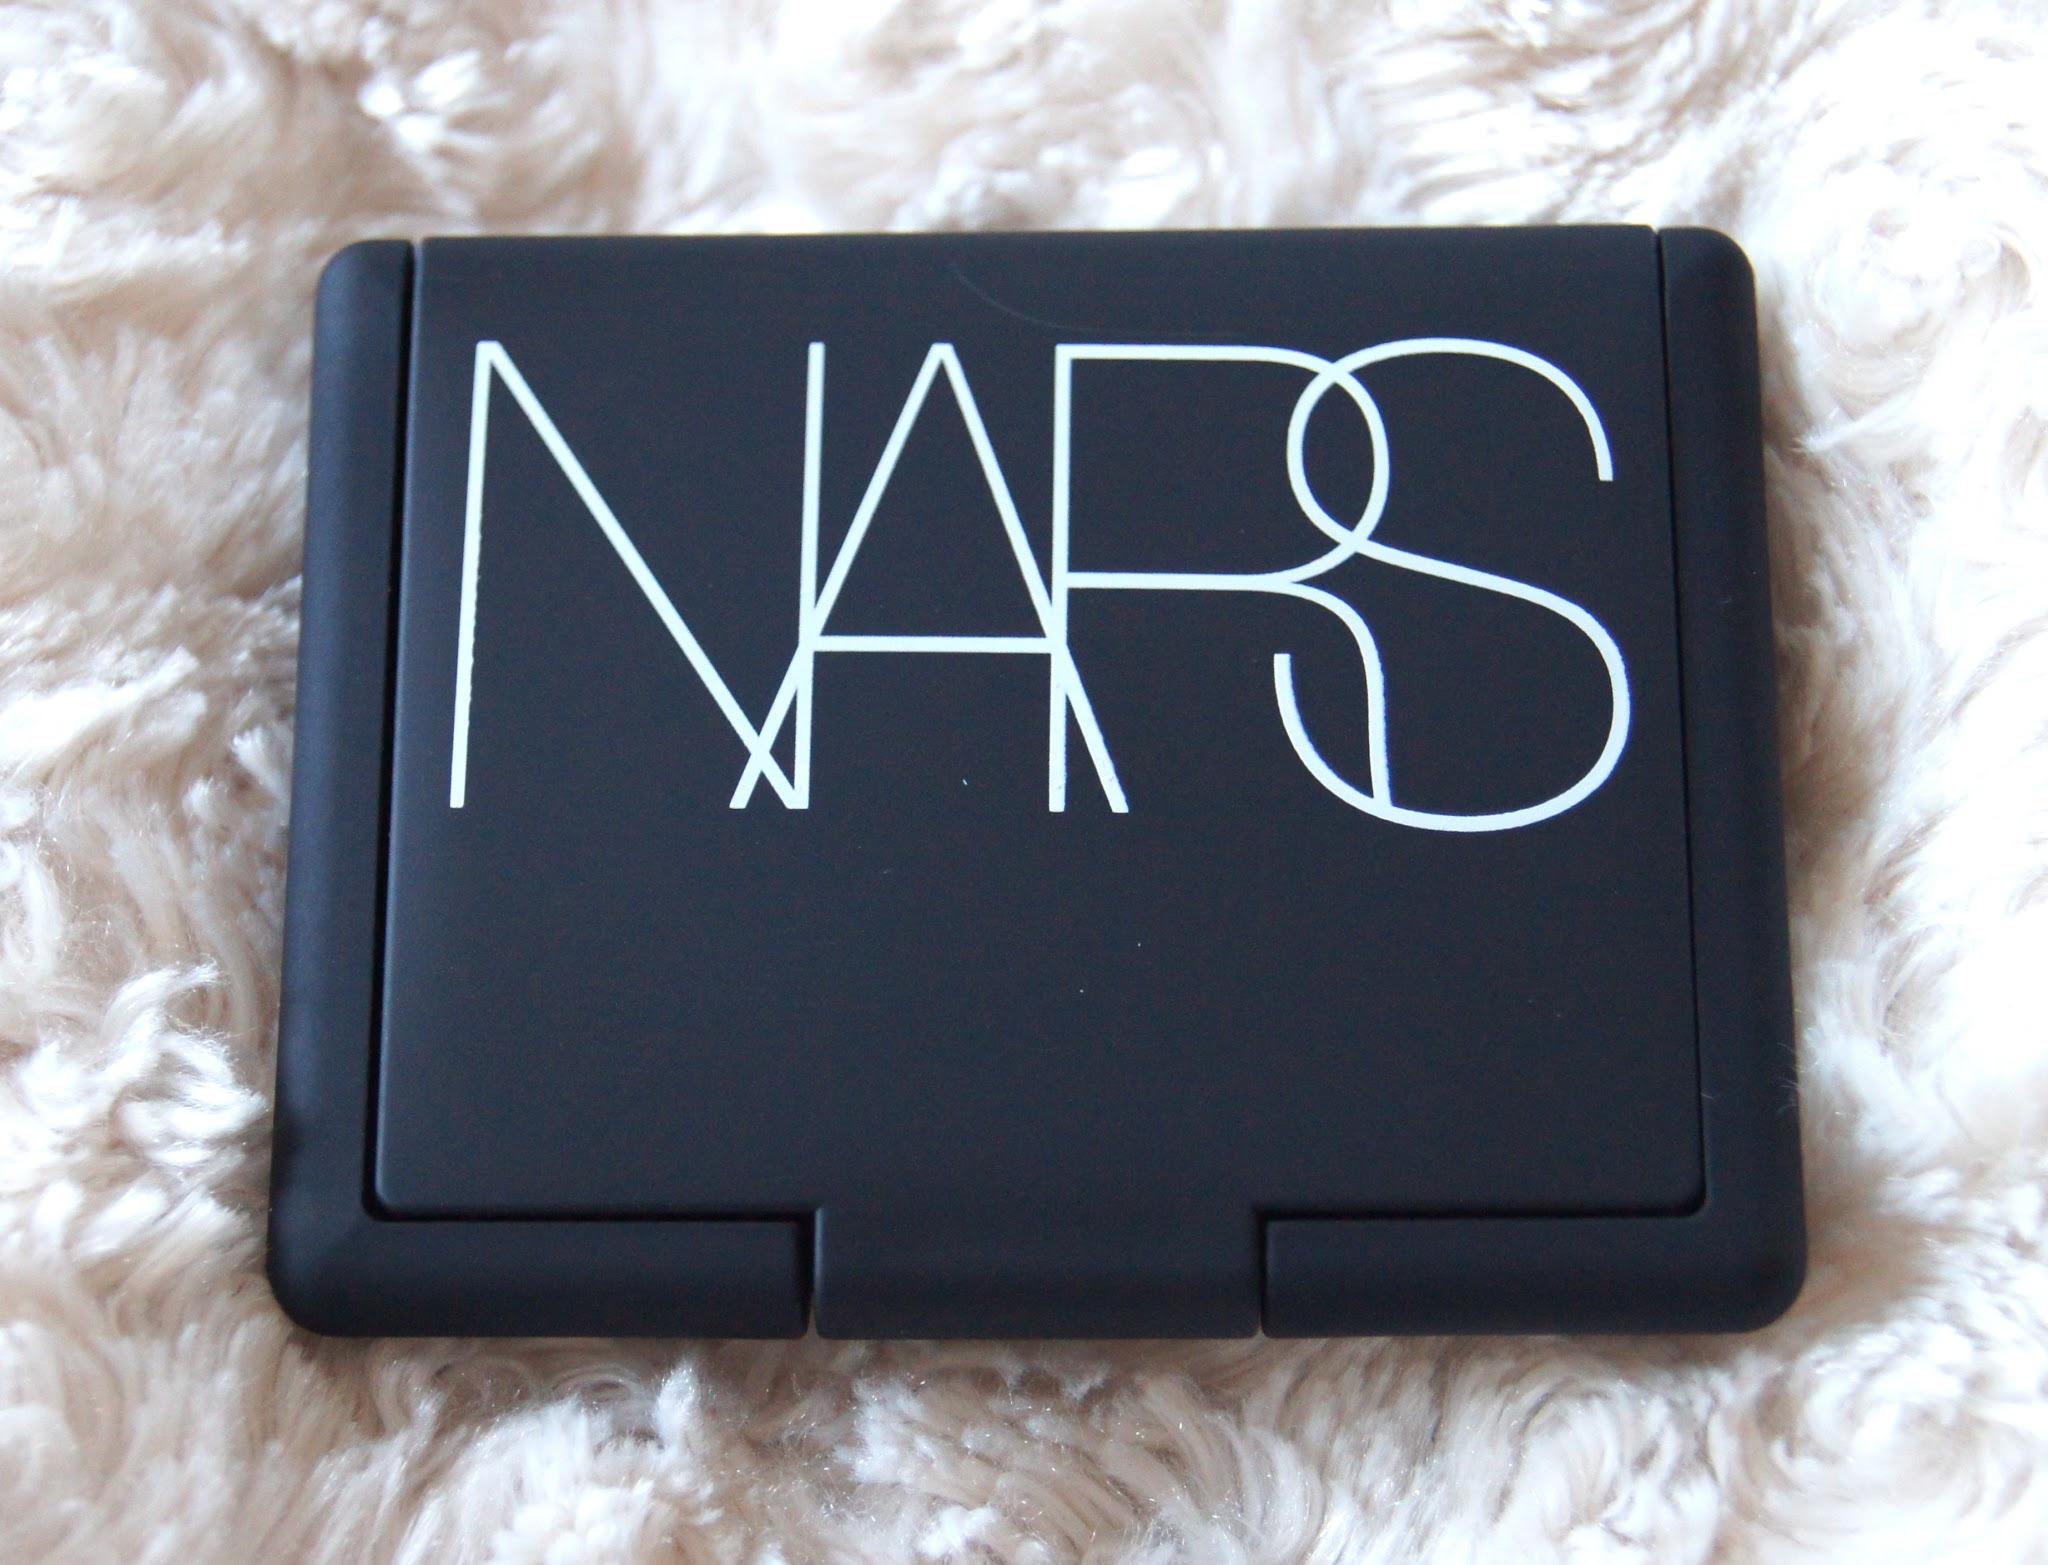 Nars Powder Blush Luster Review Swatch